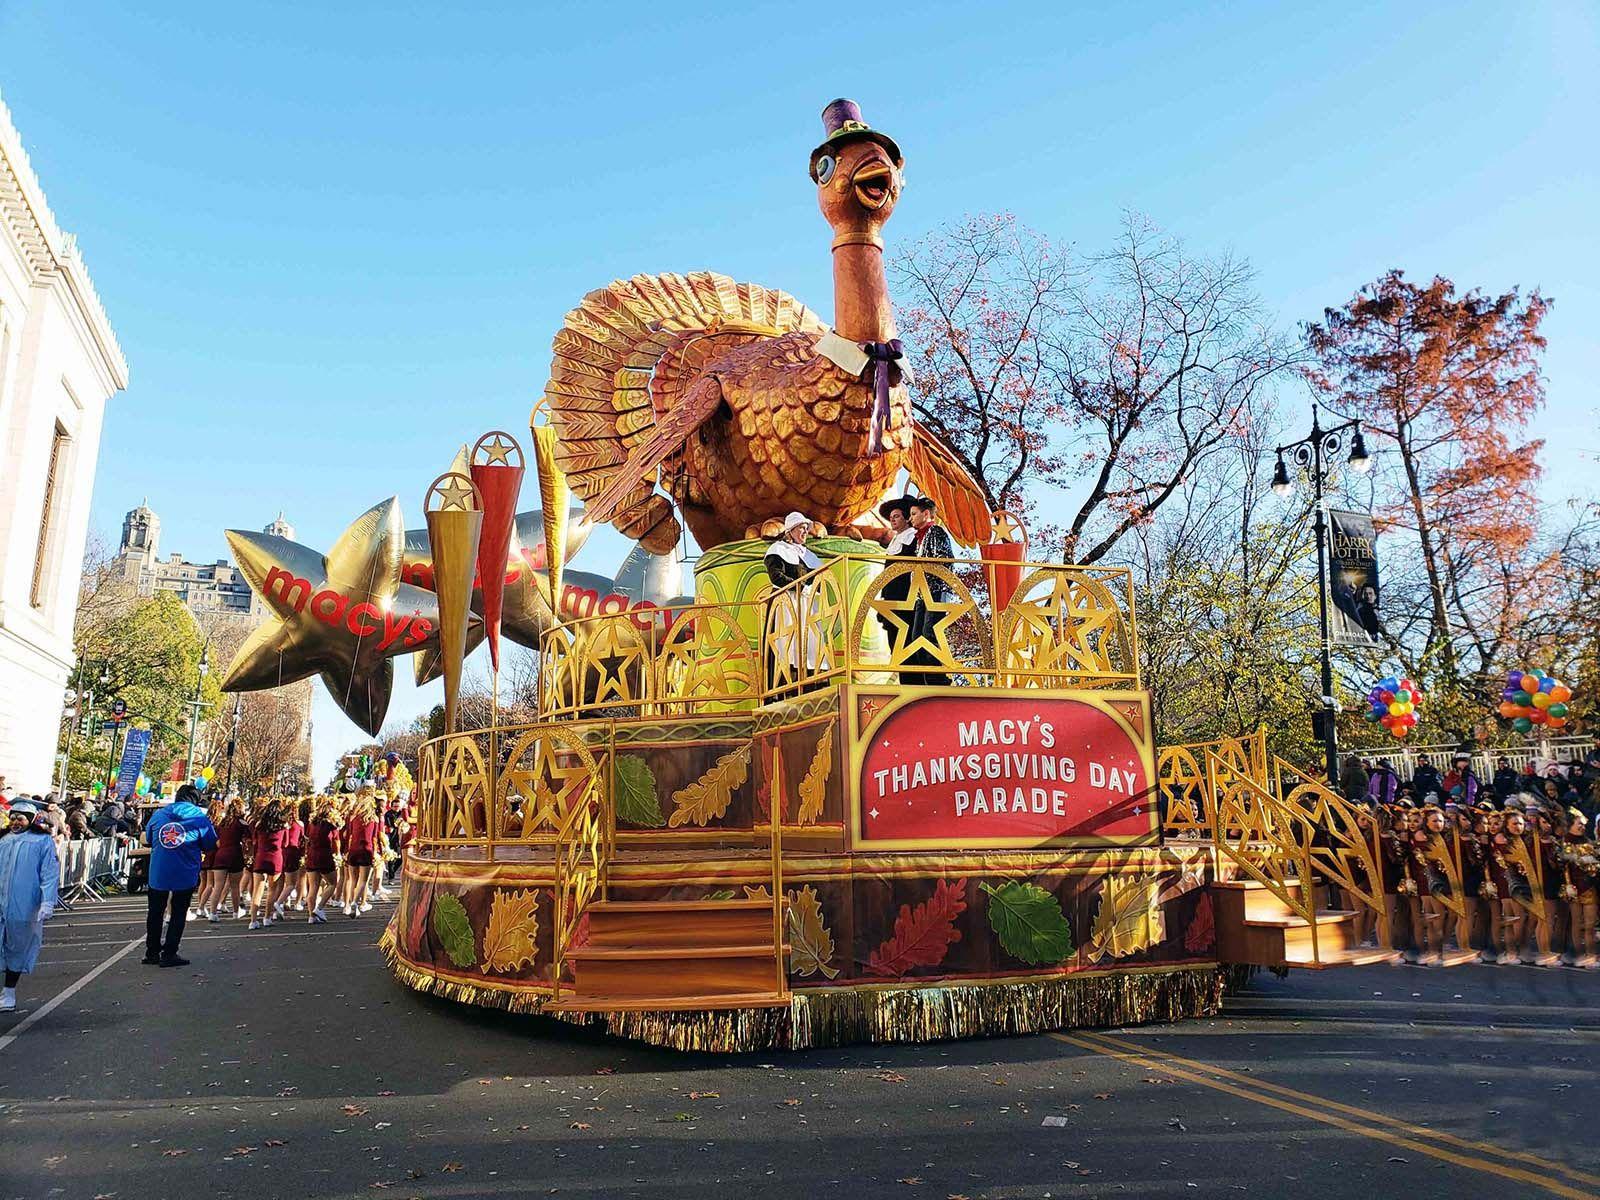 Macy S Thanksgiving Day Parade Macy S Thanksgiving Day Parade Thanksgiving Day Parade Macy S Thanksgiving Day Parade